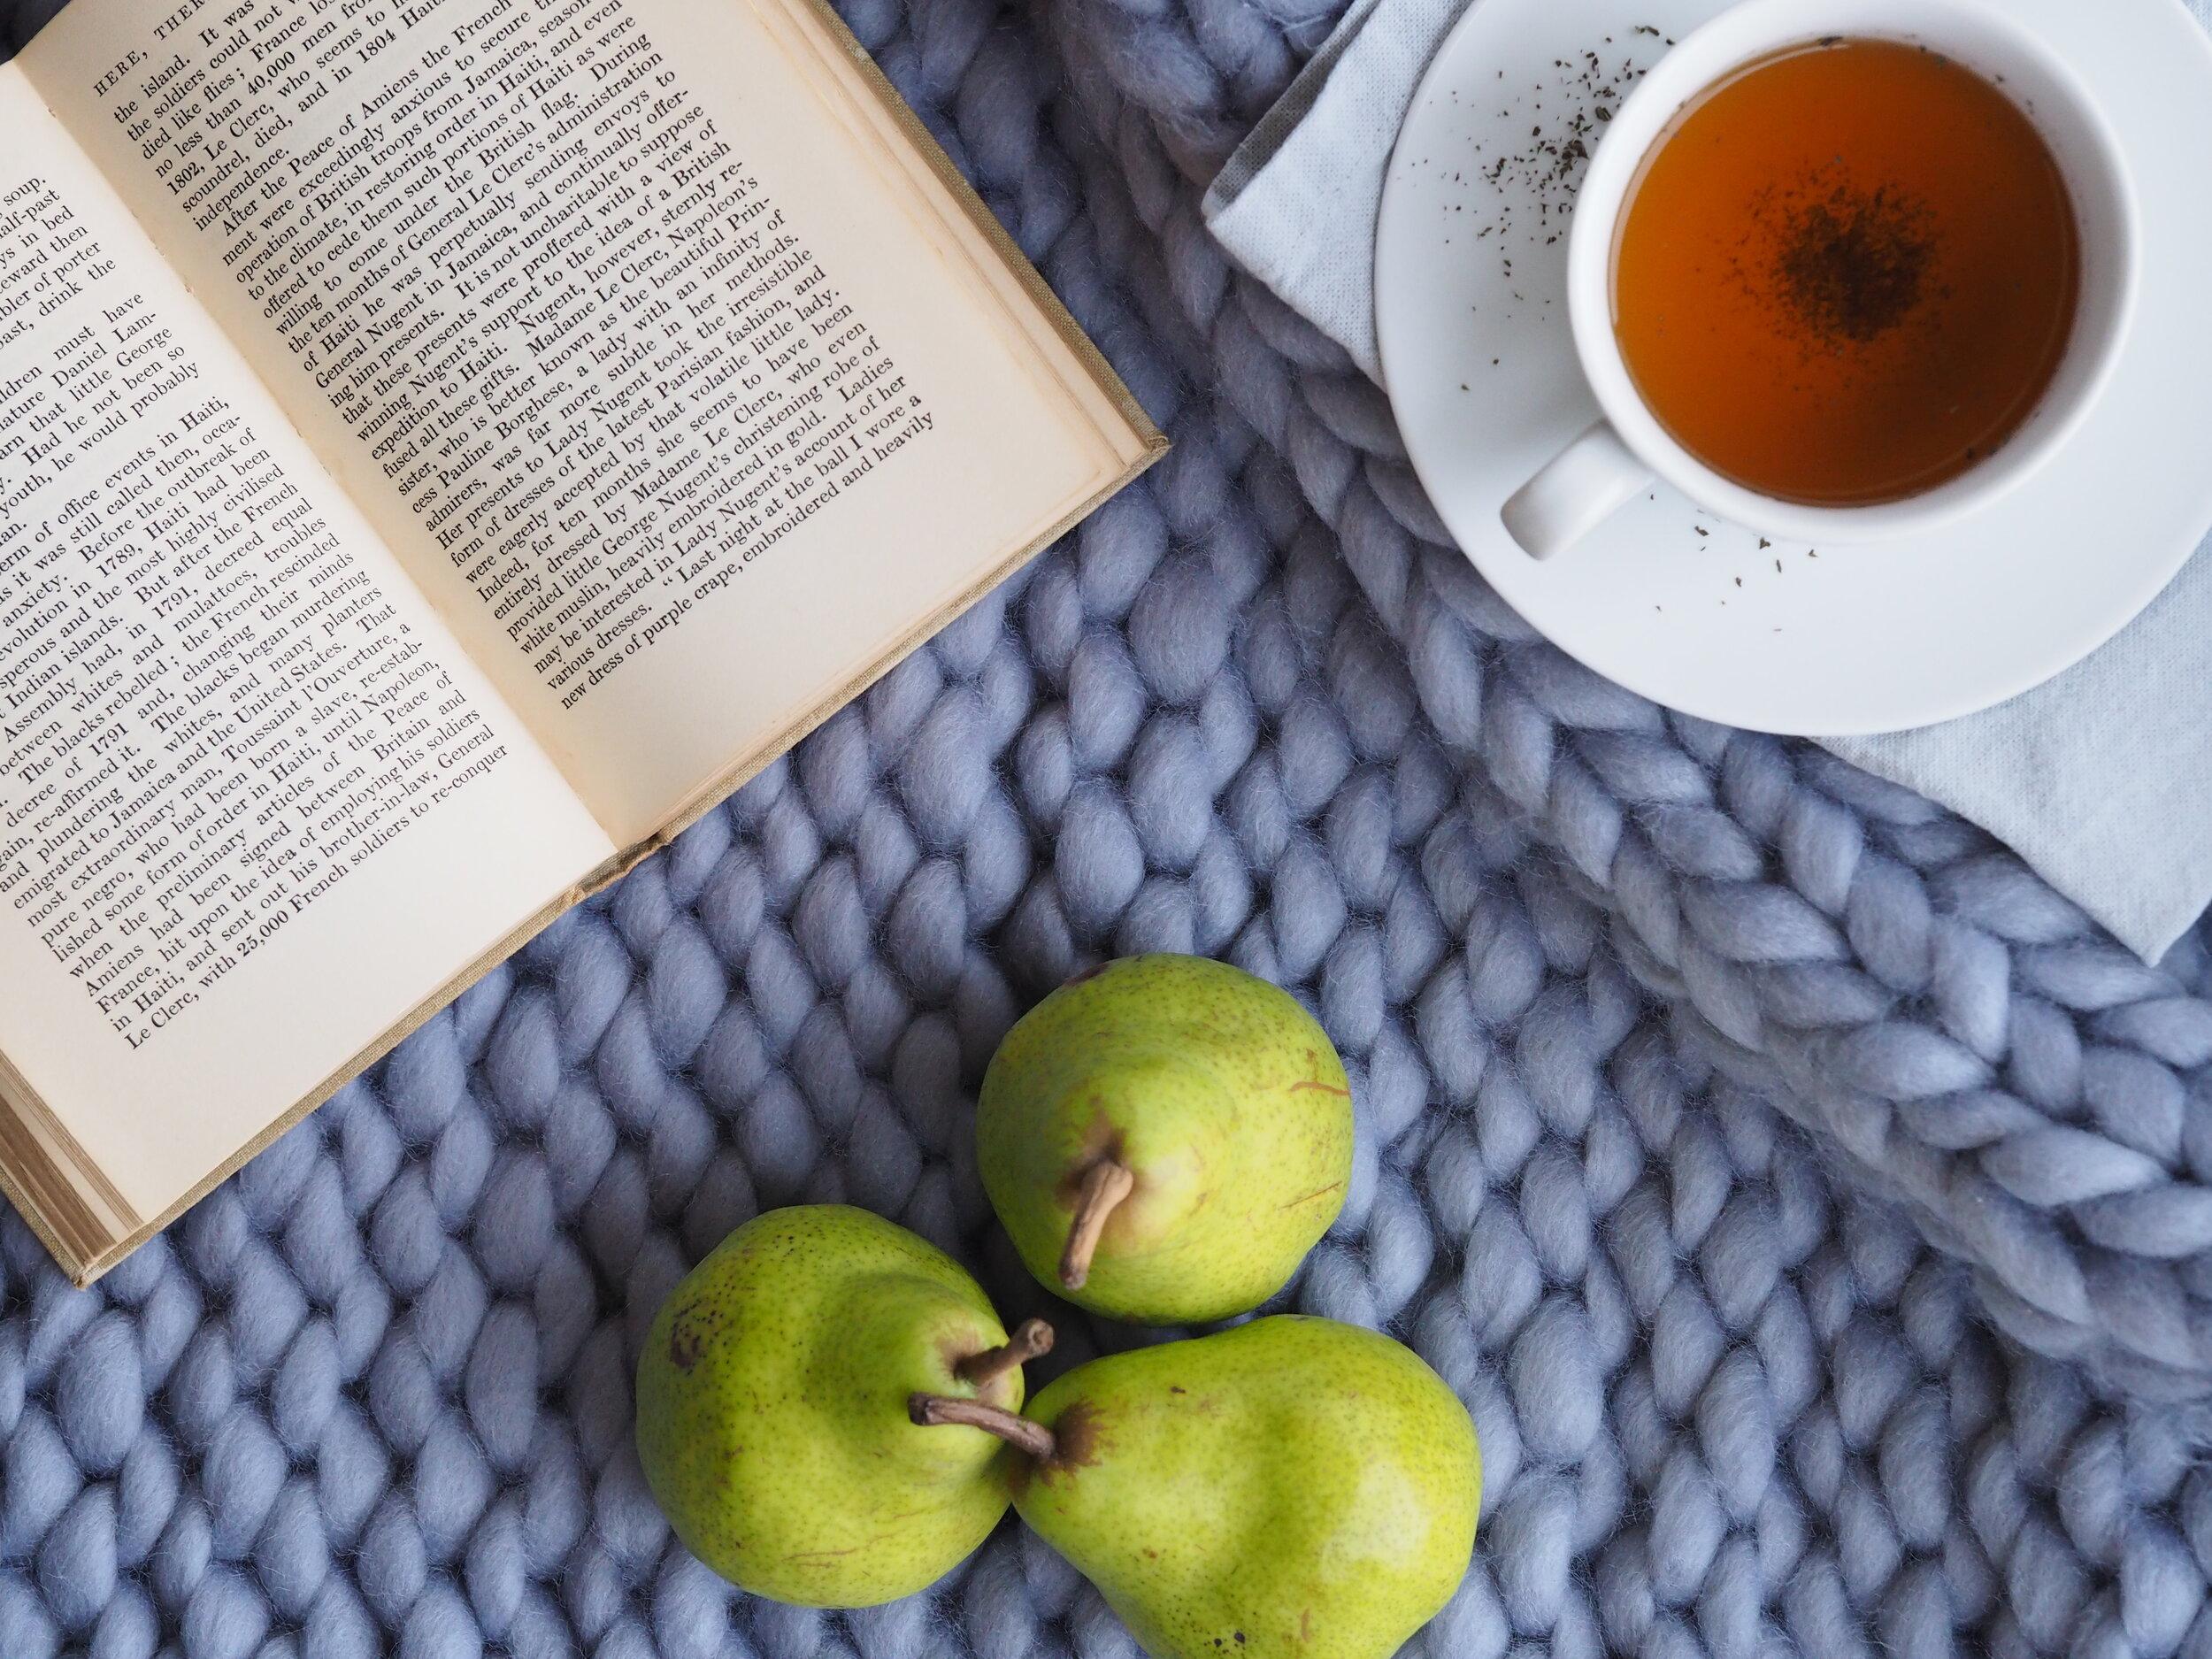 Book, blanket, hot tea & pears